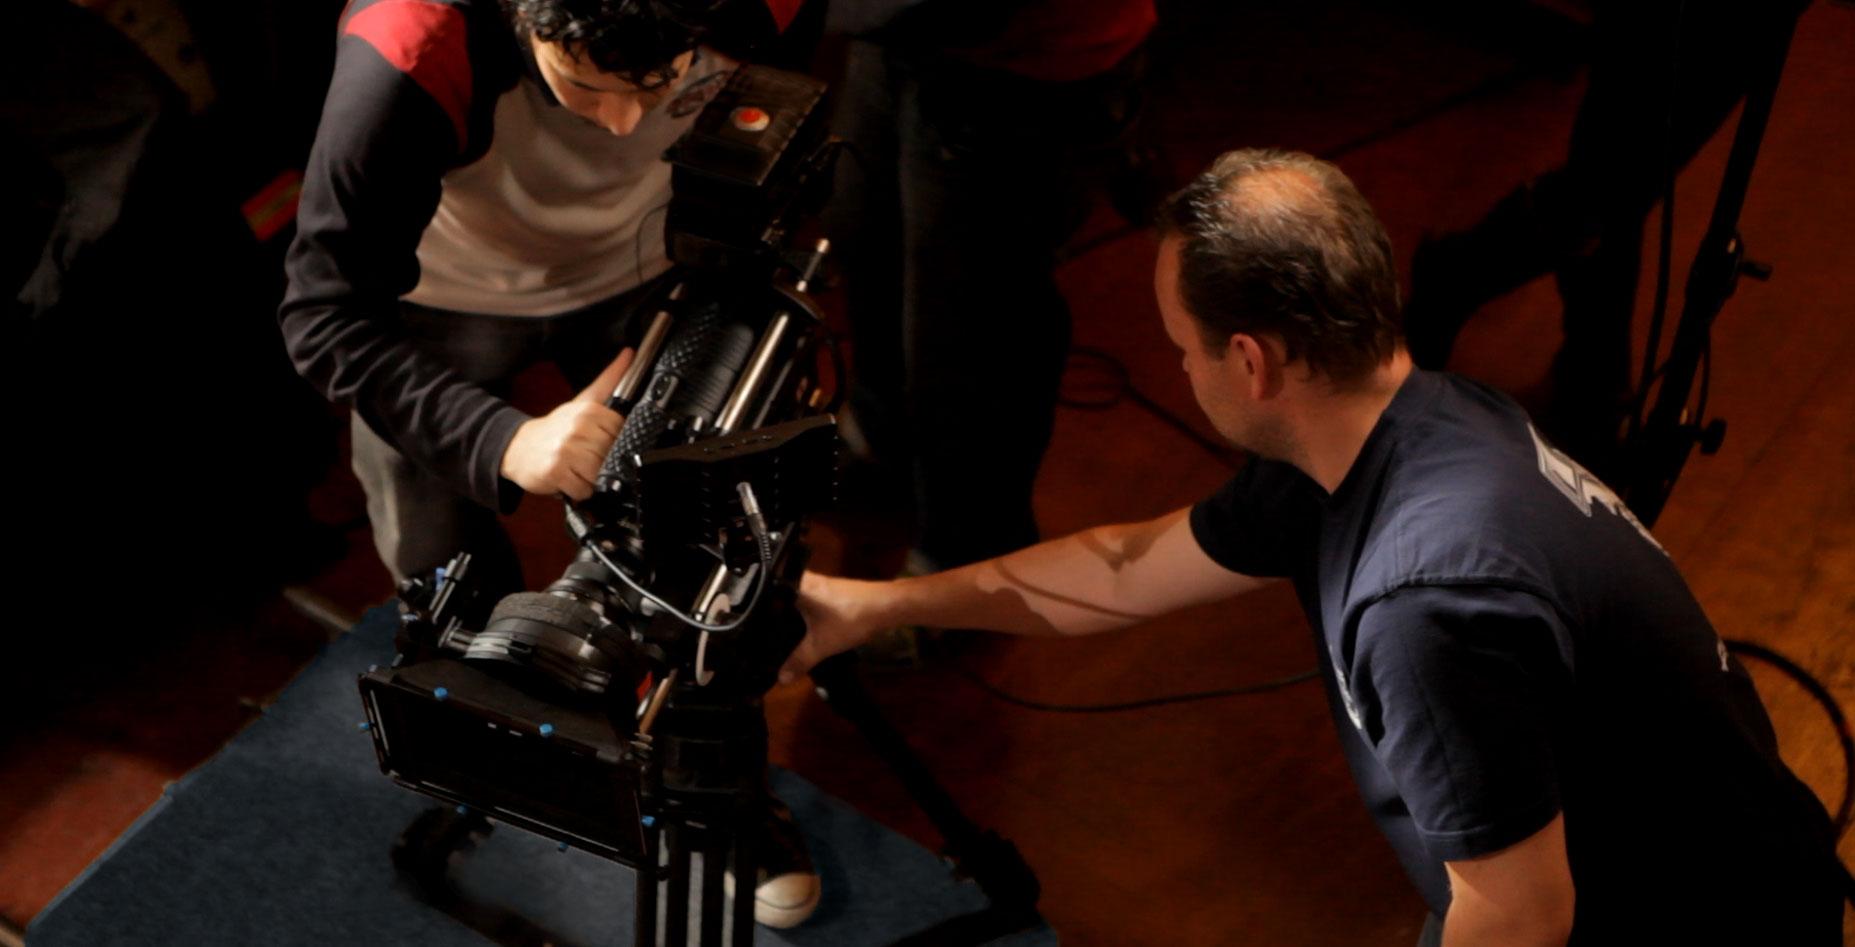 Shooting a short film in Prague